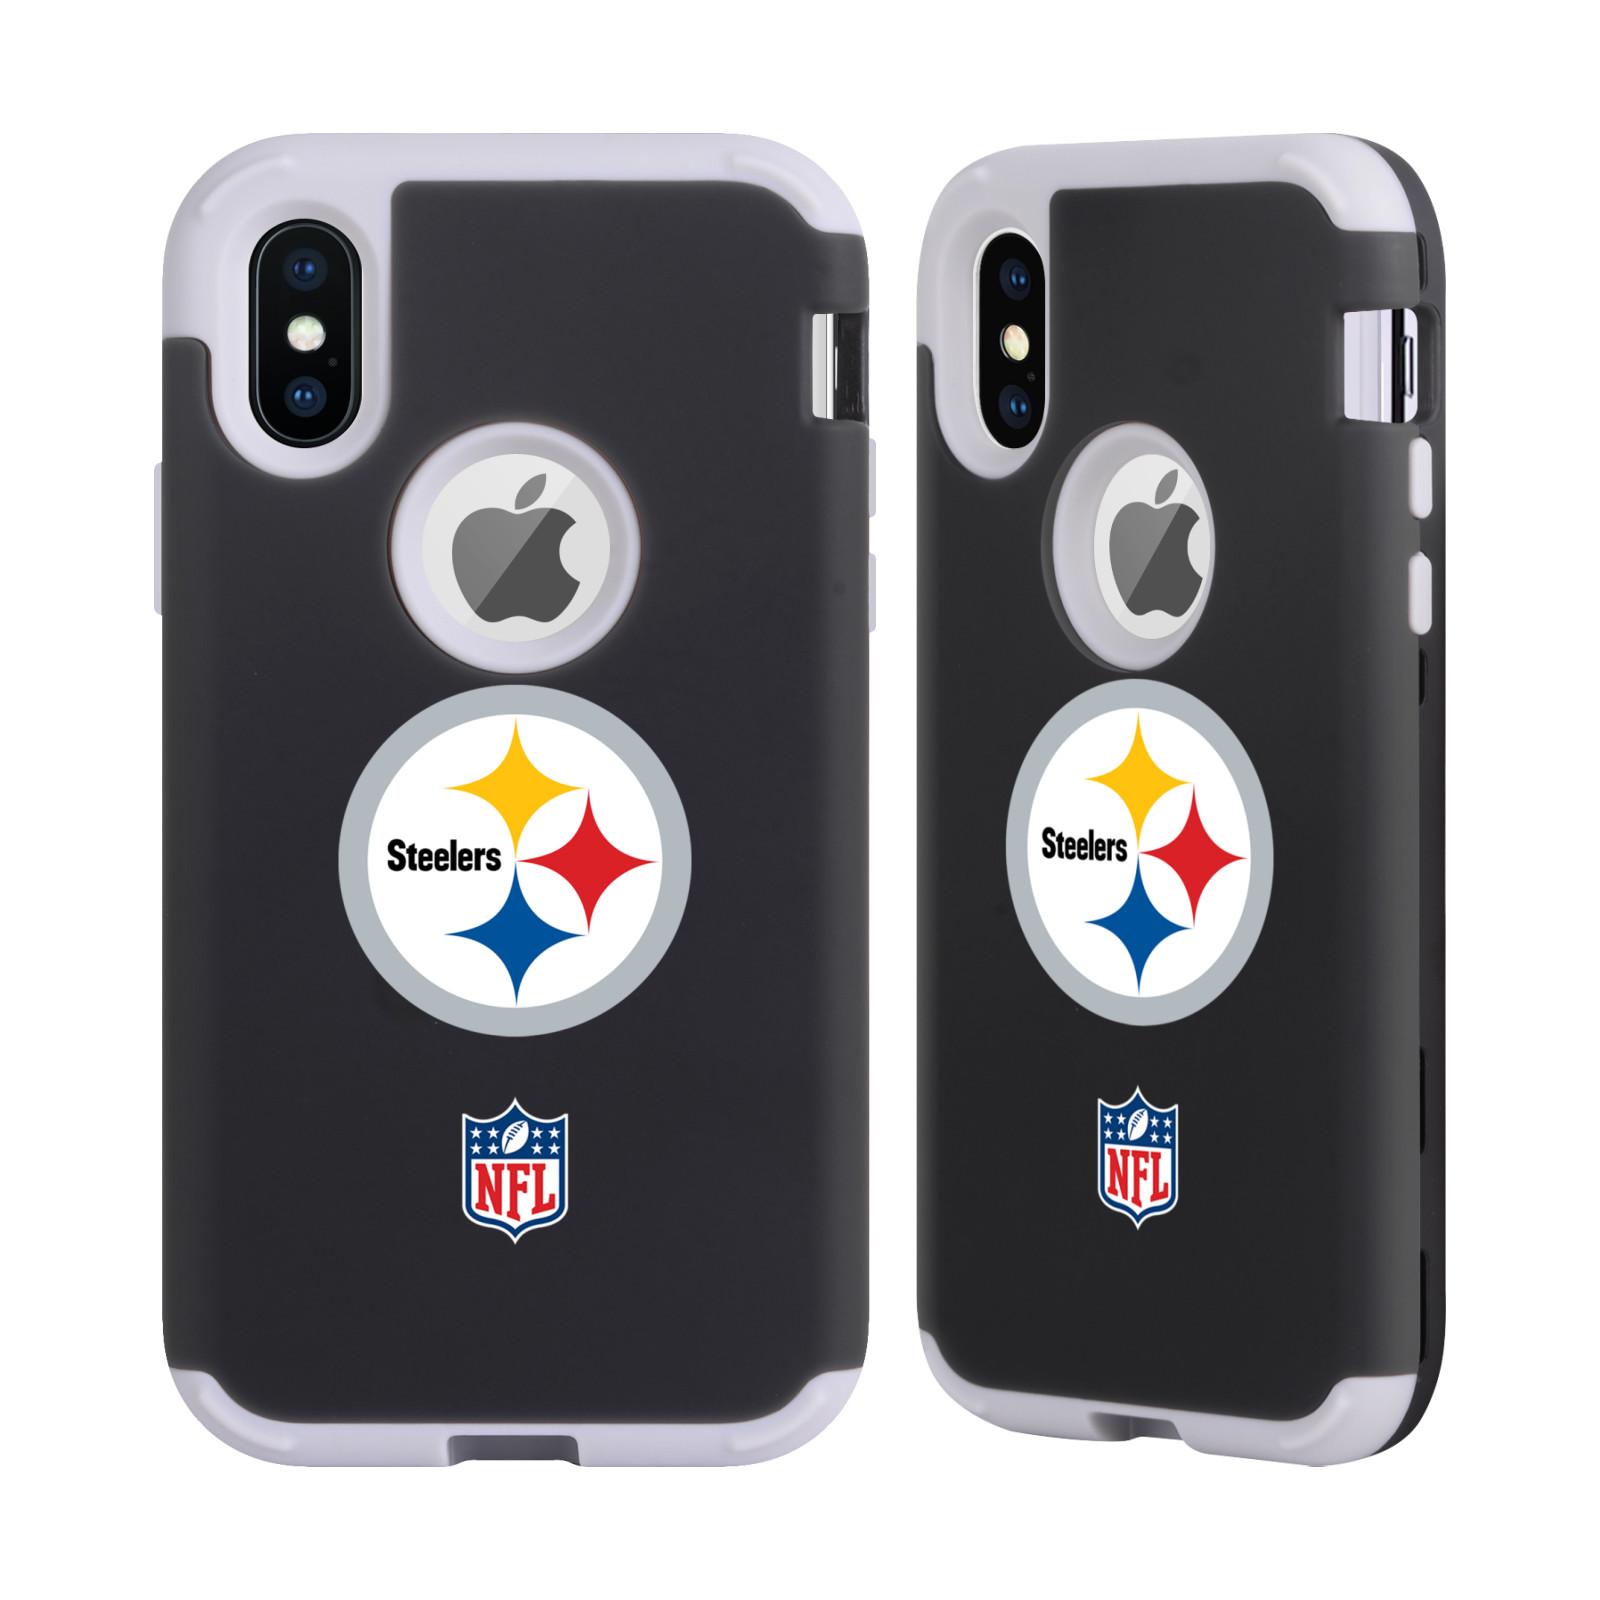 NFL-PITTSBURGH-STEELERS-LOGO-2-GREY-SENTRY-CASE-FOR-APPLE-iPHONE-SAMSUNG-PHONES